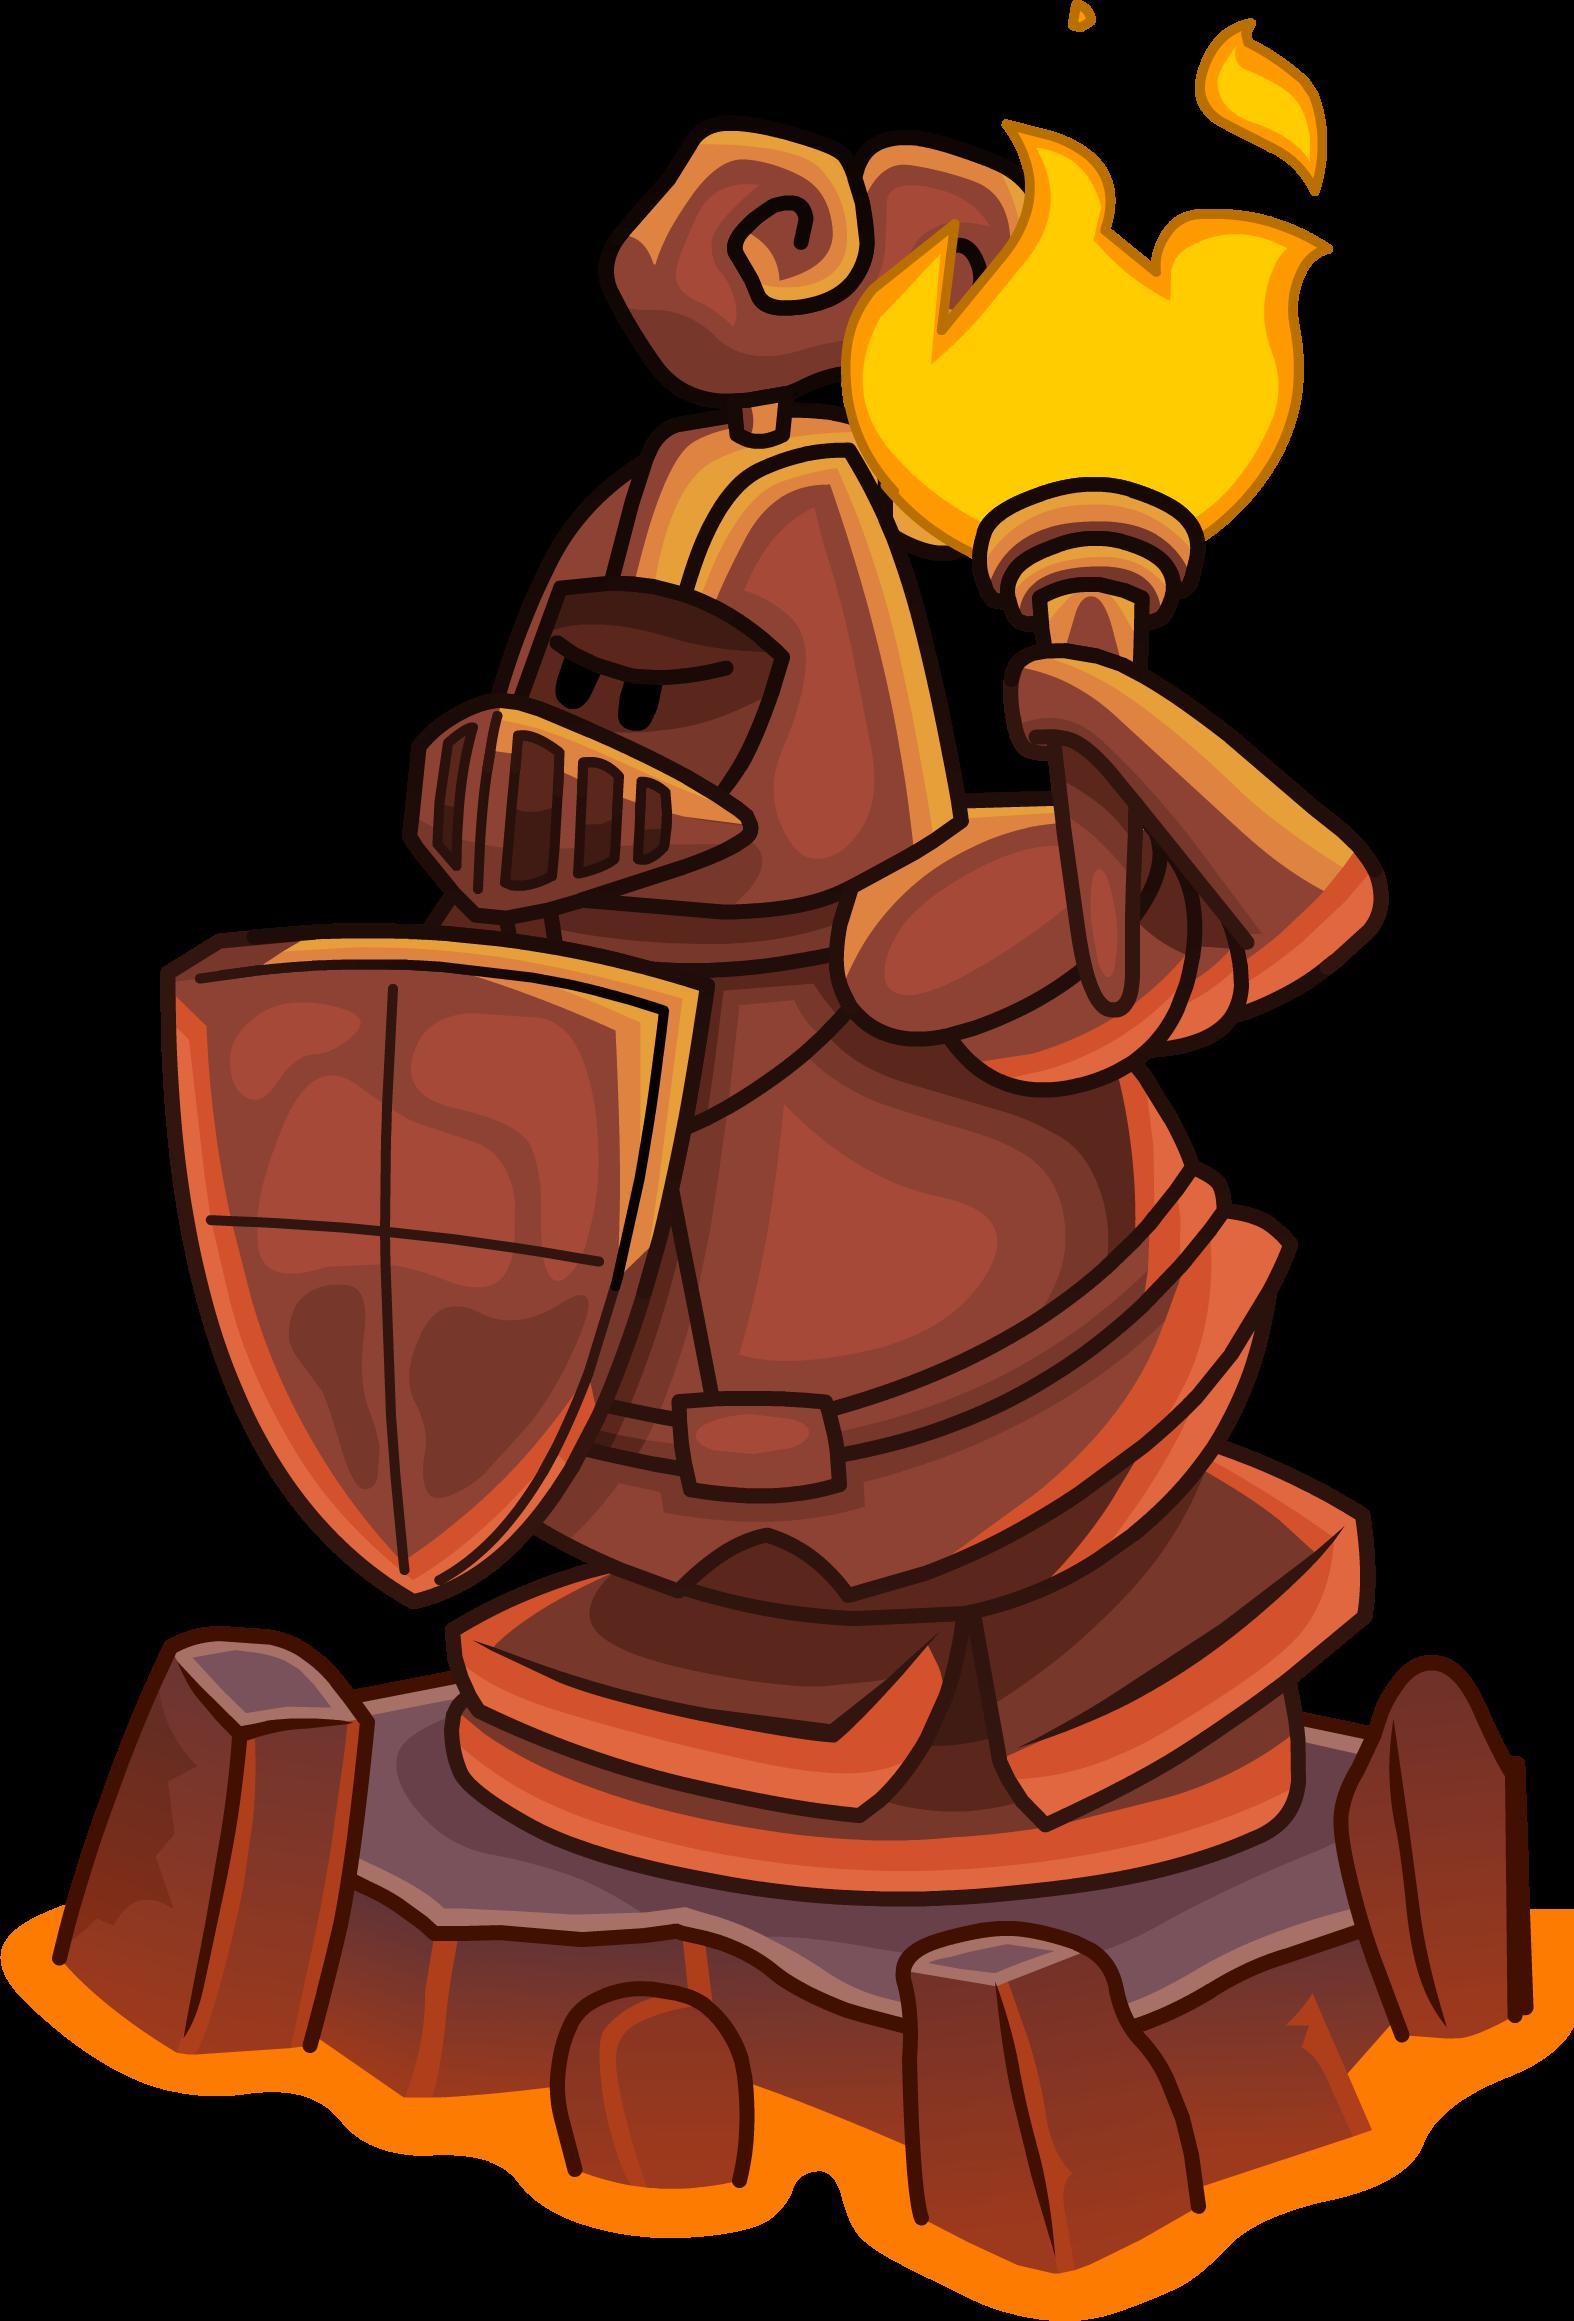 Knight clipart silver knight. Image s quest statue